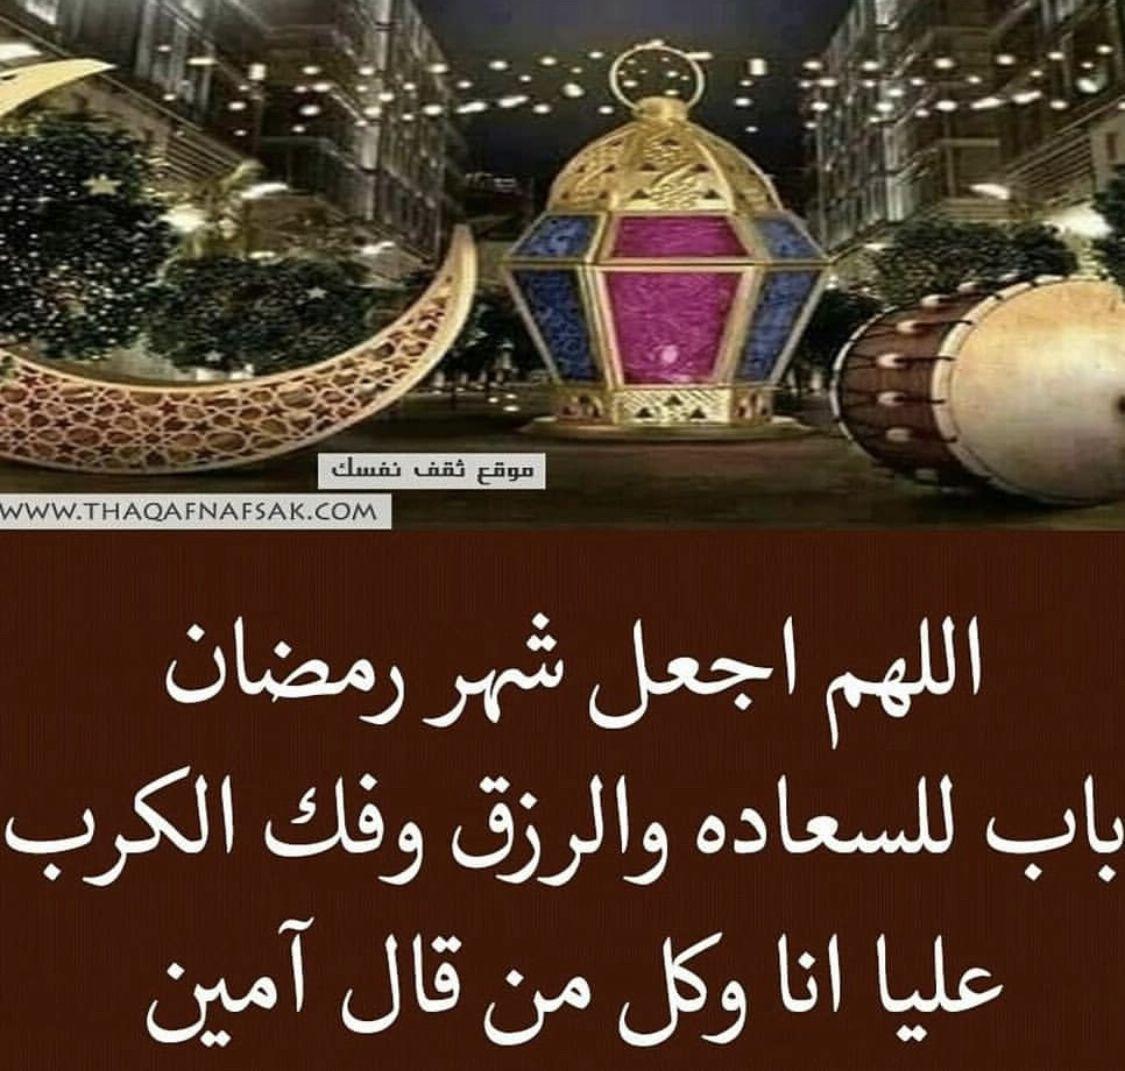 Pin By Mam On Allah Christmas Bulbs Ramadan Holiday Decor